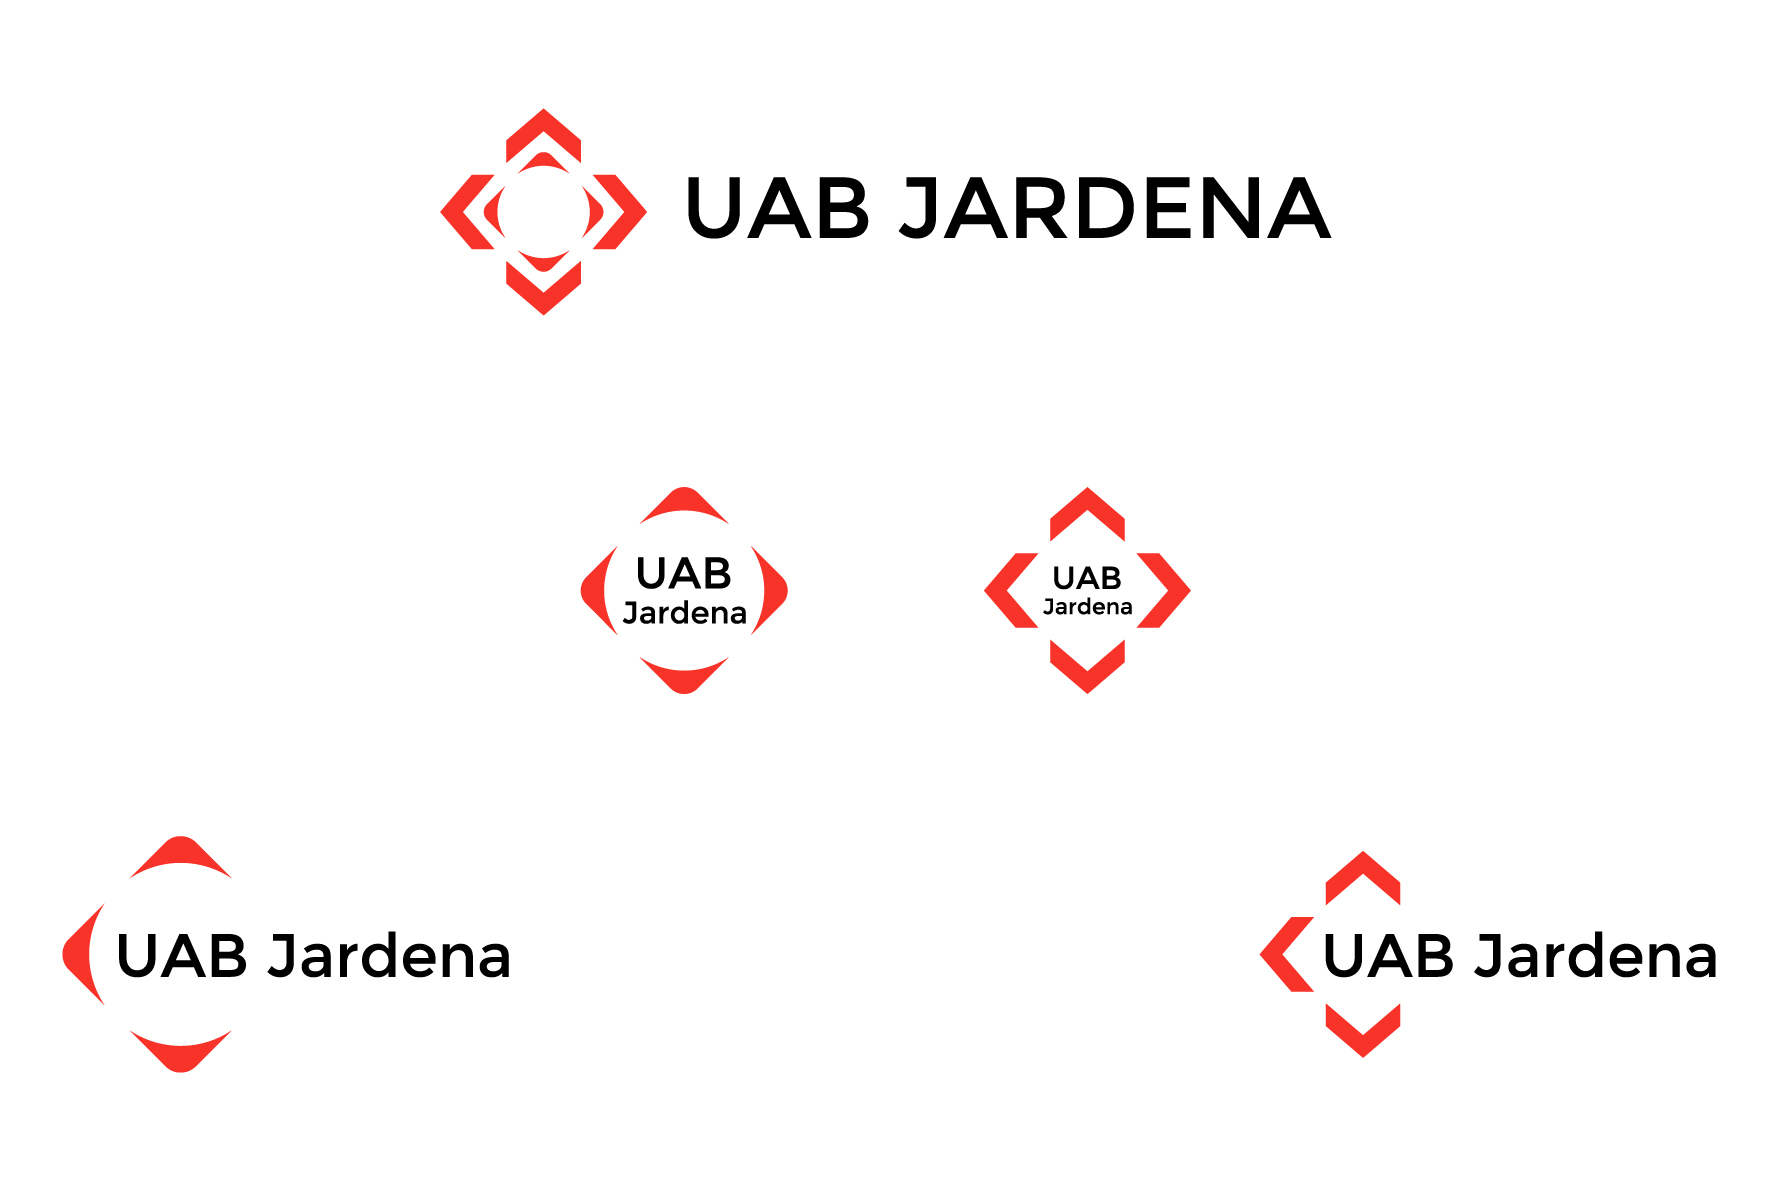 uab_jardena_a.jpg title=